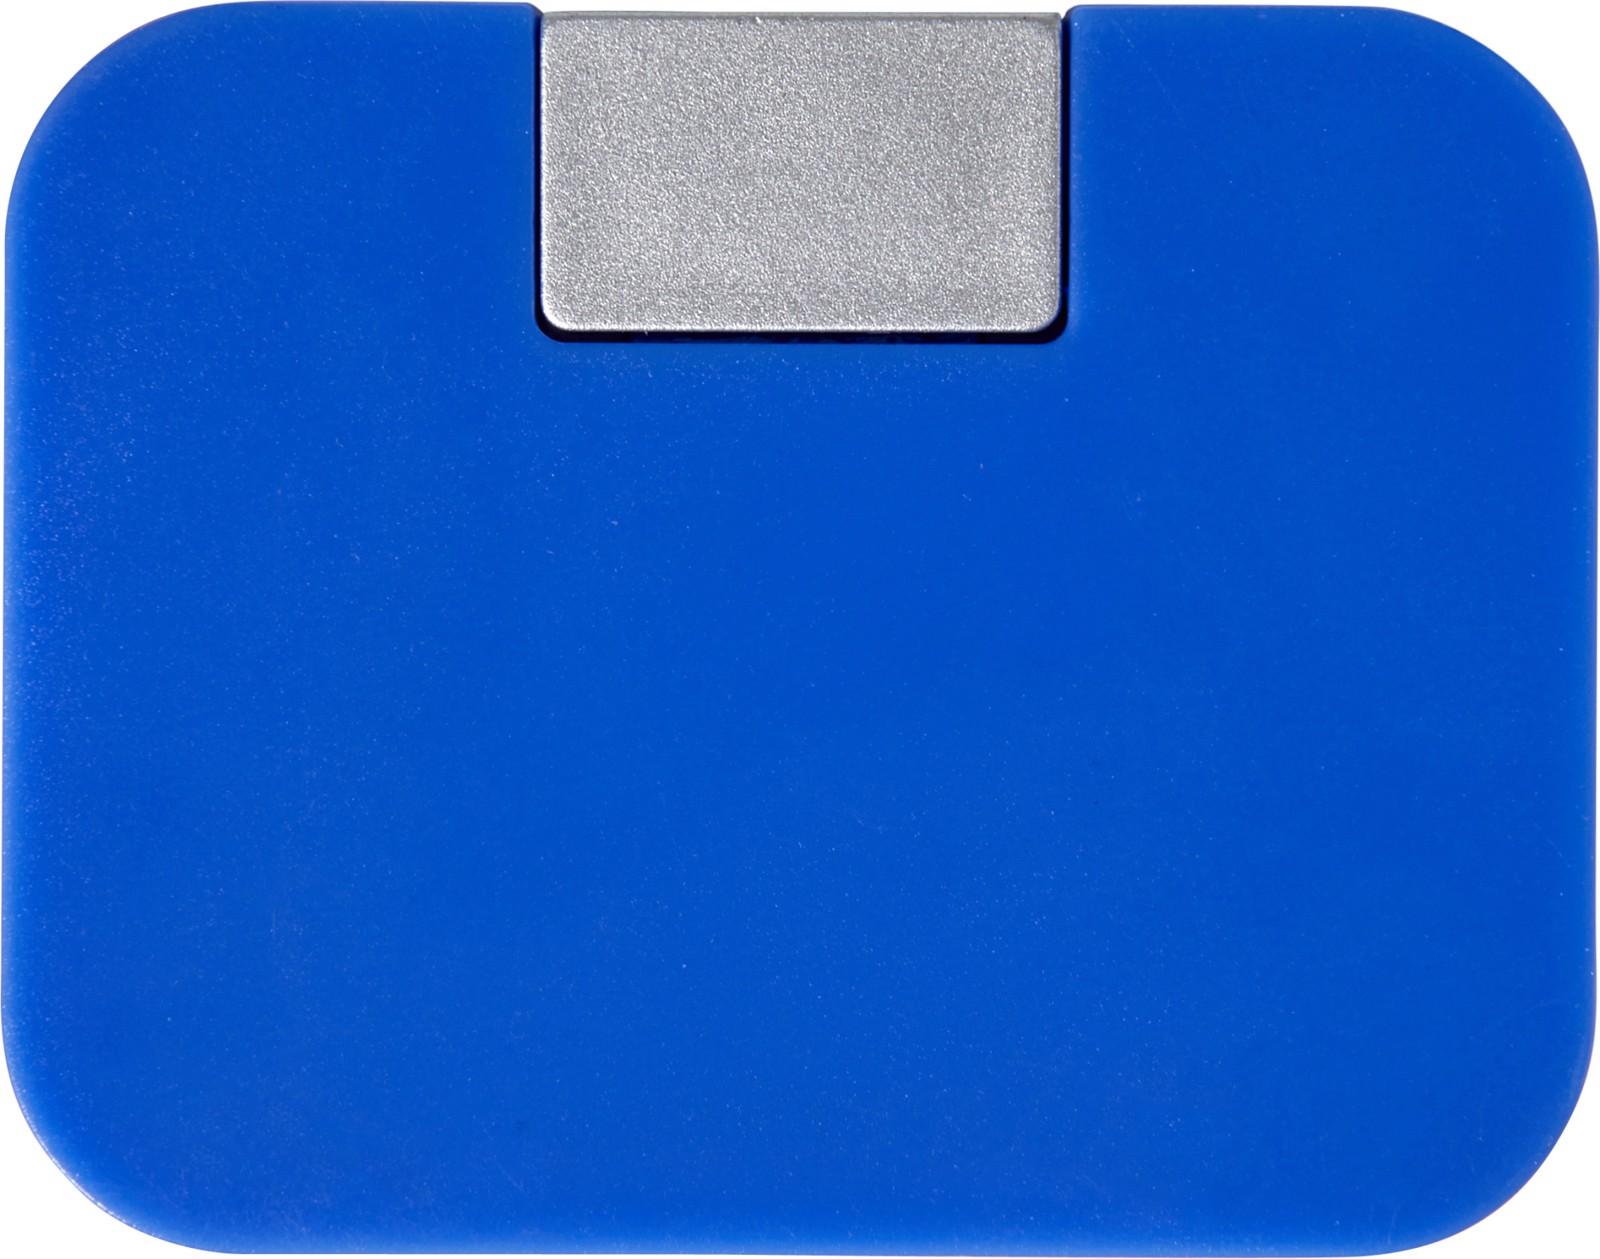 ABS USB hub - Blue